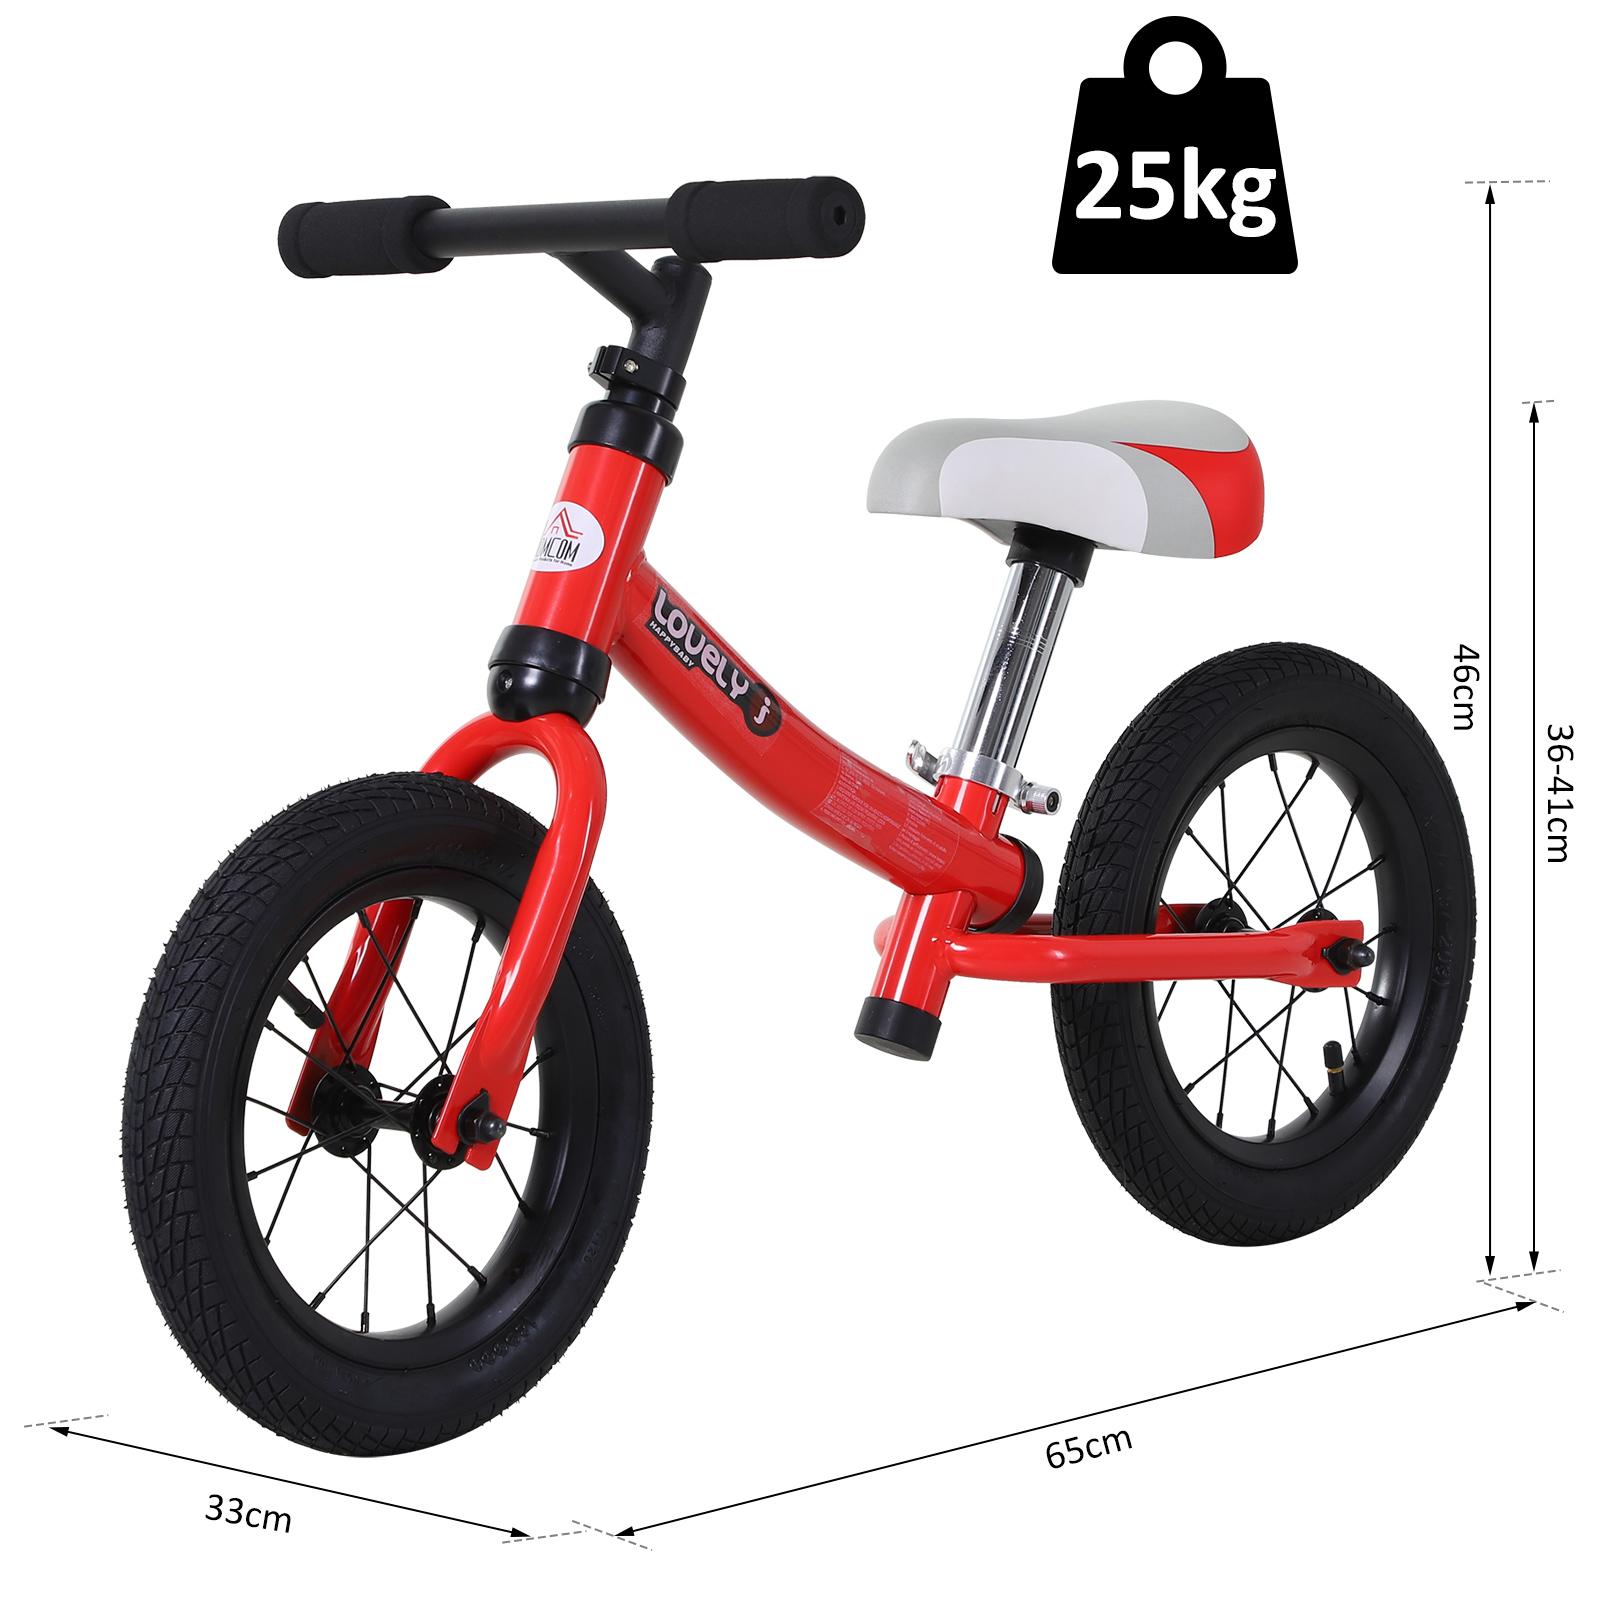 Bicicleta-sin-Pedales-de-Altura-de-Asiento-Regulable-31-45cm-2-5-Anos miniatura 20